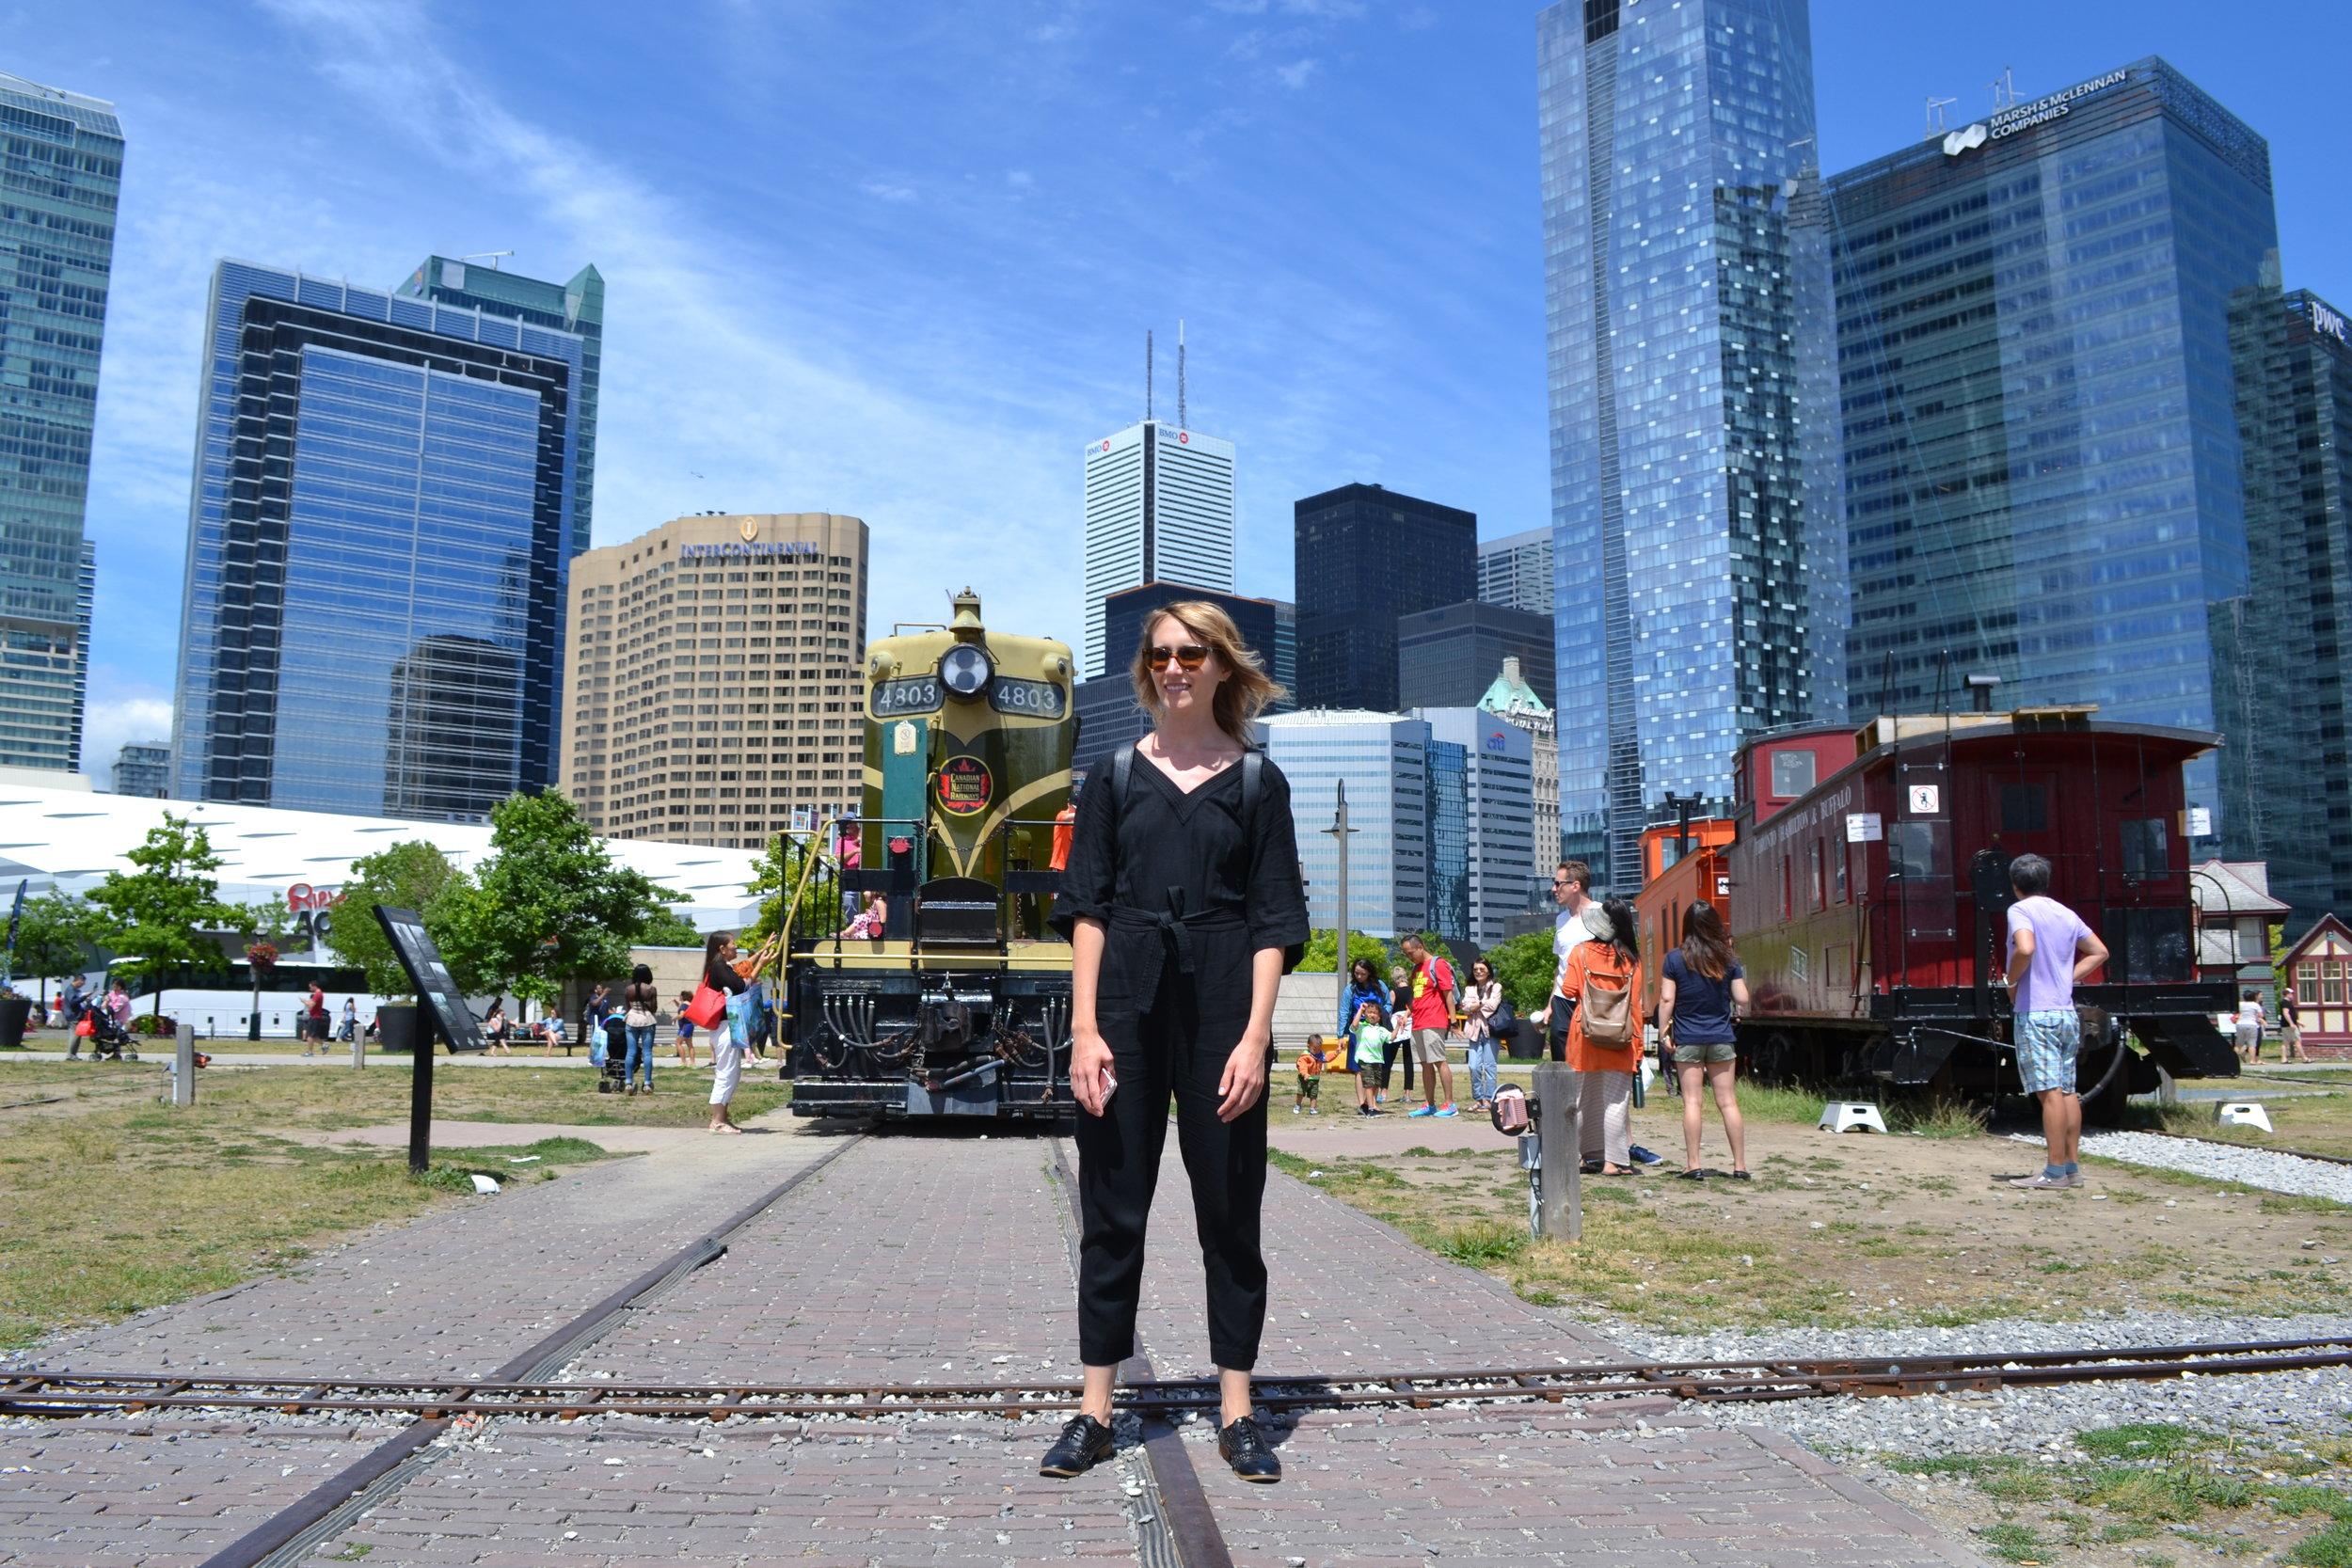 Toronto!